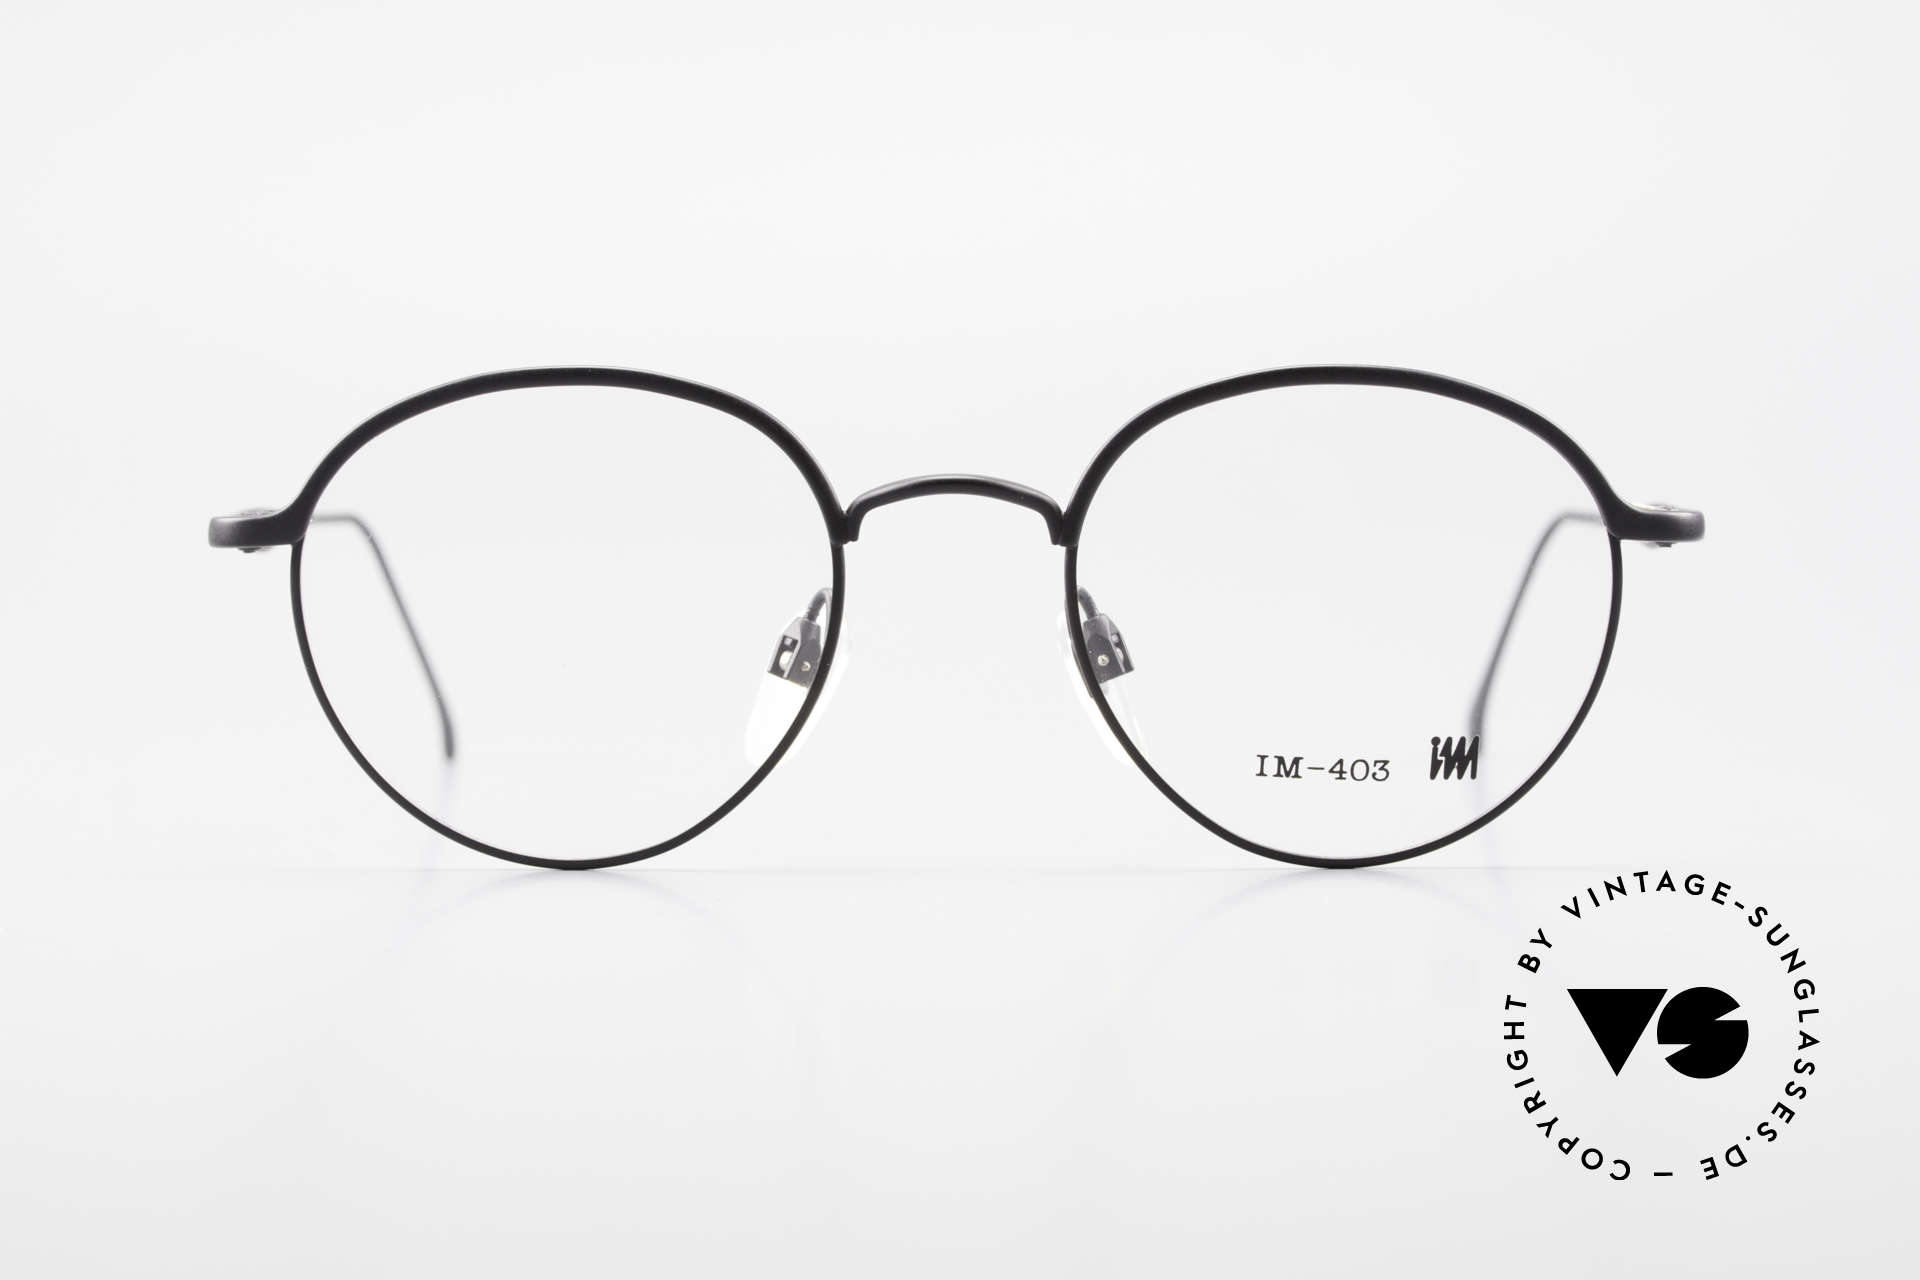 Miyake Design Studio IM403 Connoisseur Panto Glasses 90's, true INSIDER eyeglasses without big branding, Made for Men and Women